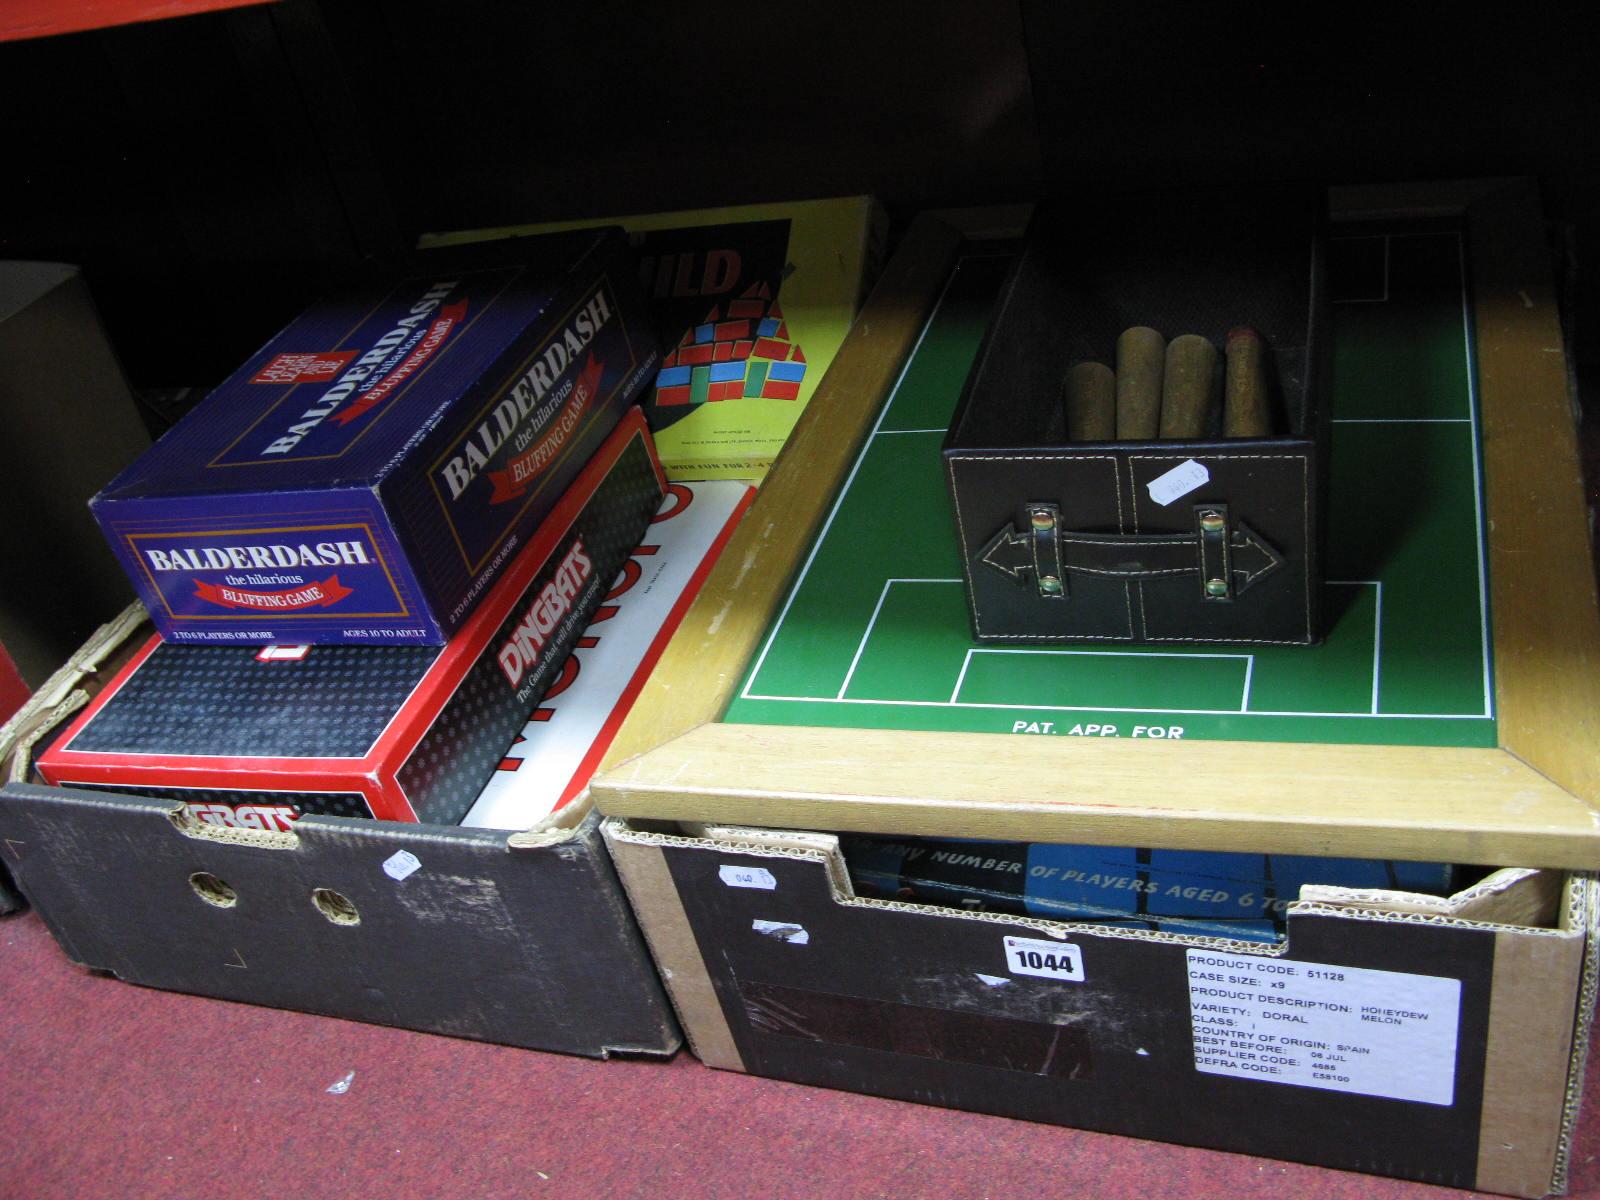 Lot 1044 - Board Games Monopoly; Digbats, Balderdash, Pais, other games, etc Two boxes.